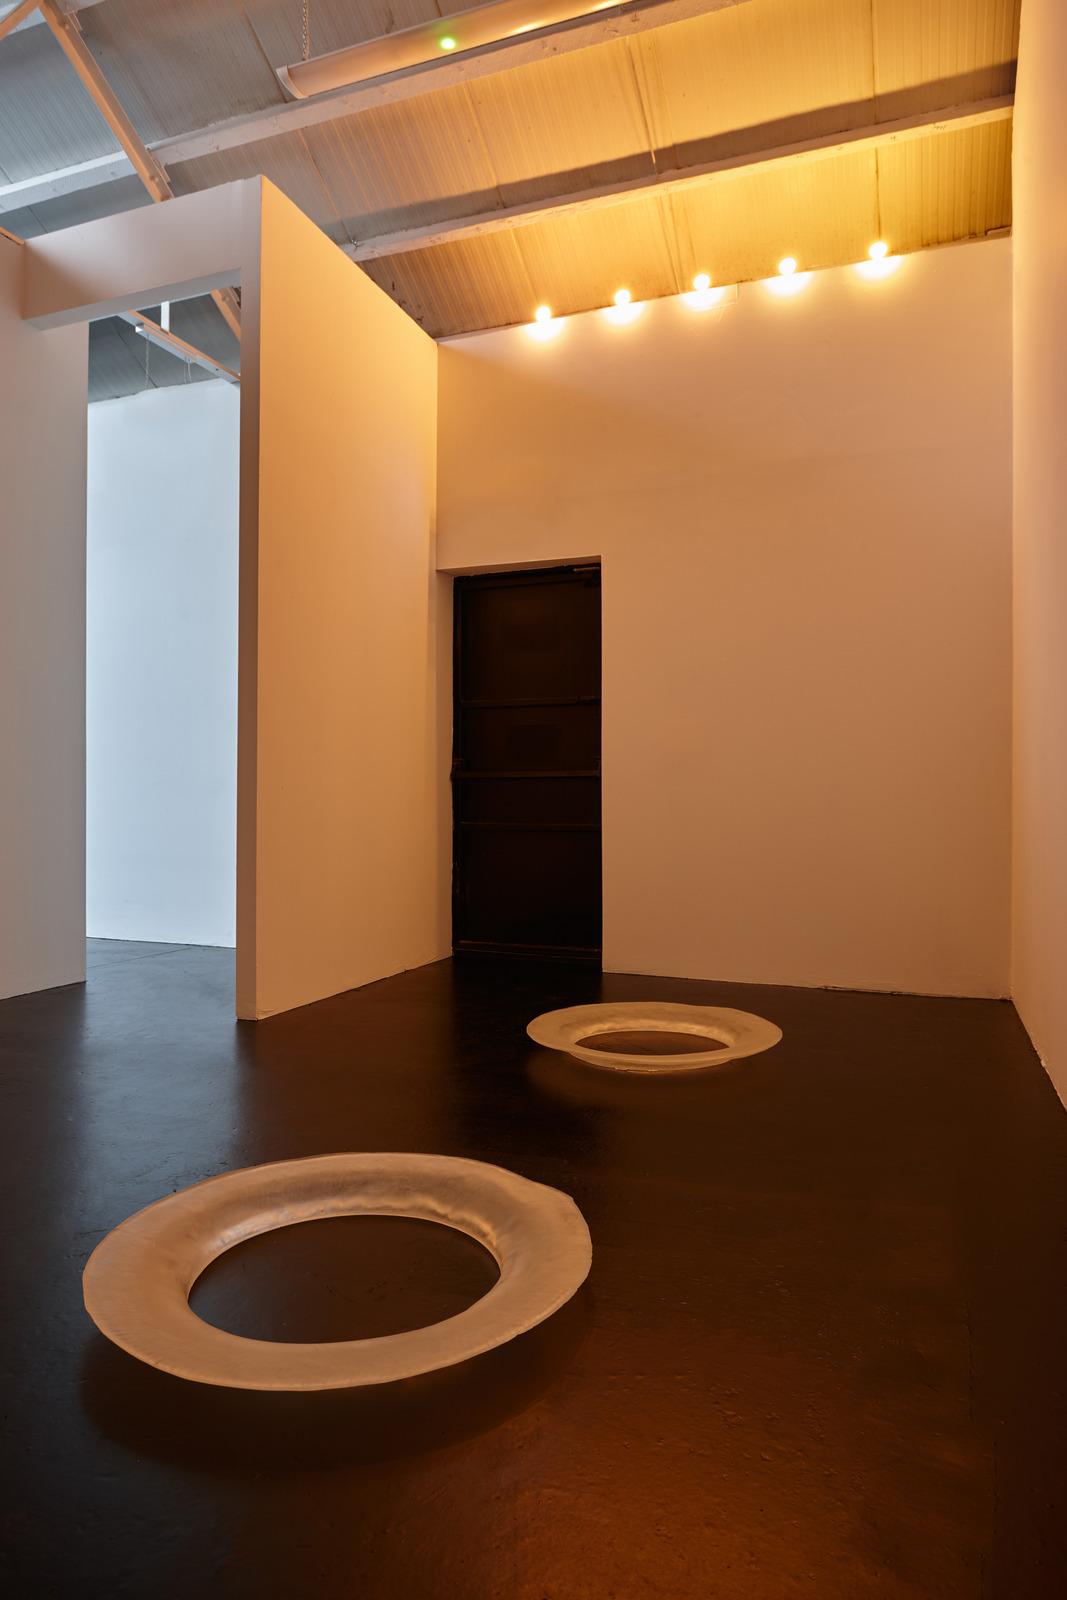 Ryan Estep - 5 - Installation View XV